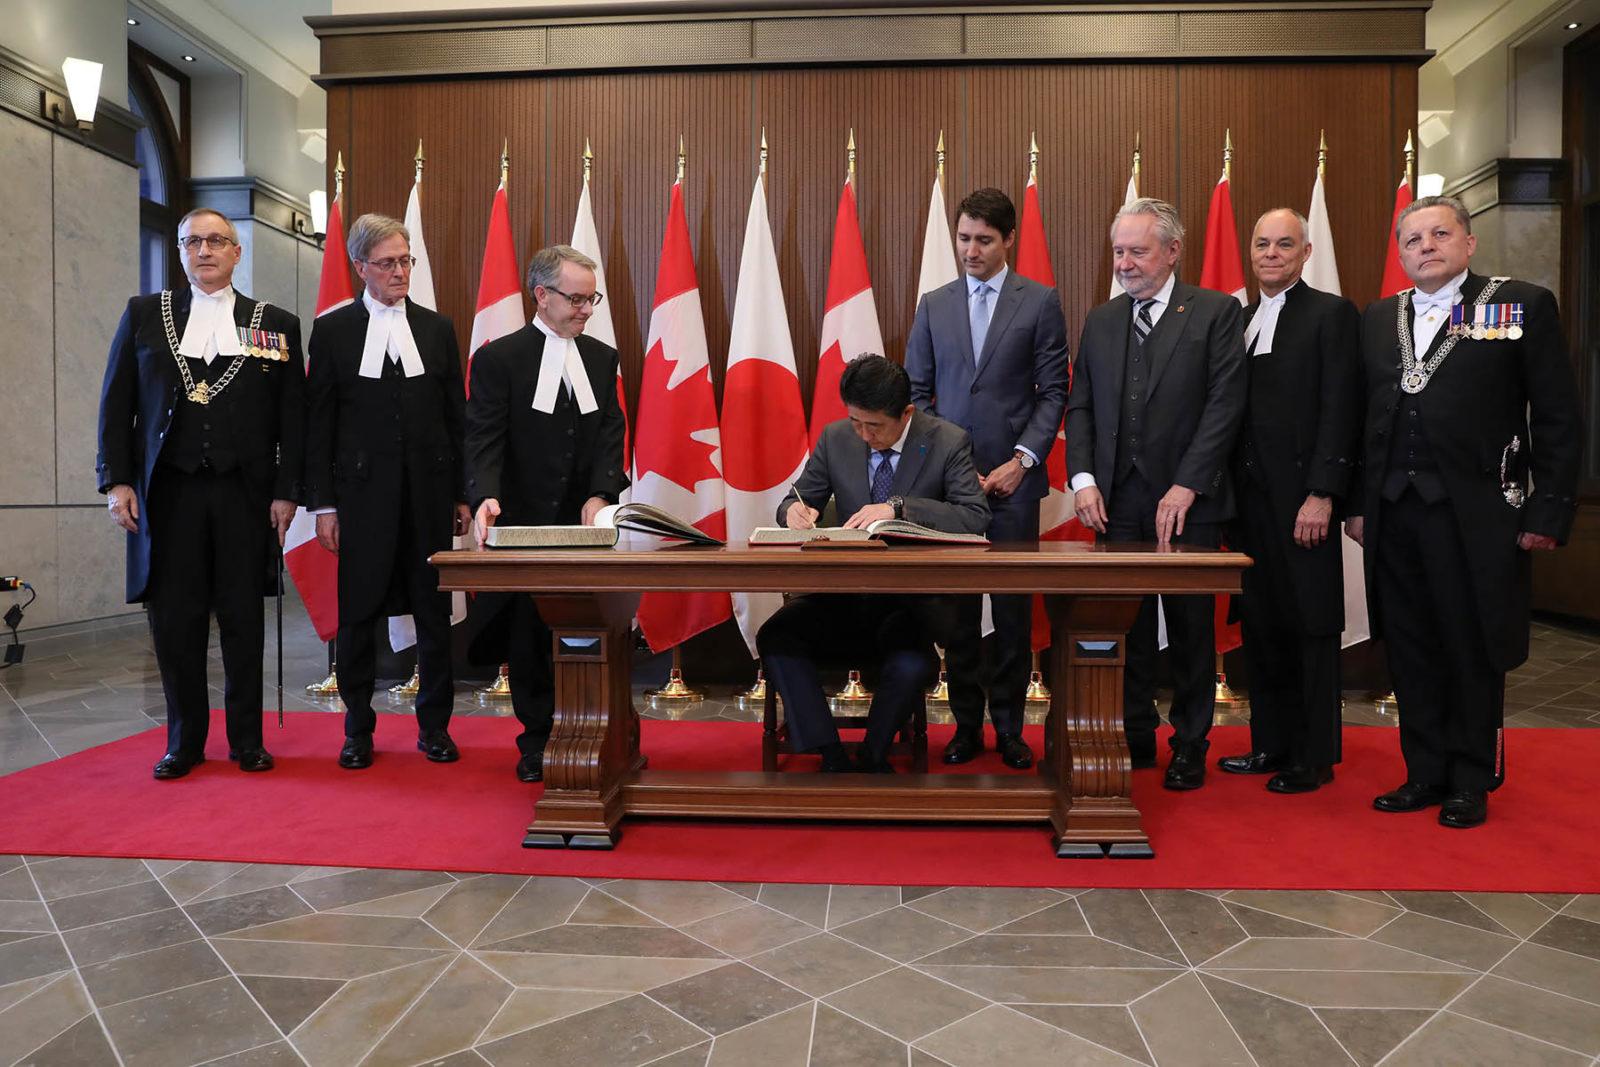 PHOTOS | Senator Harder greets Japanese Prime Minister